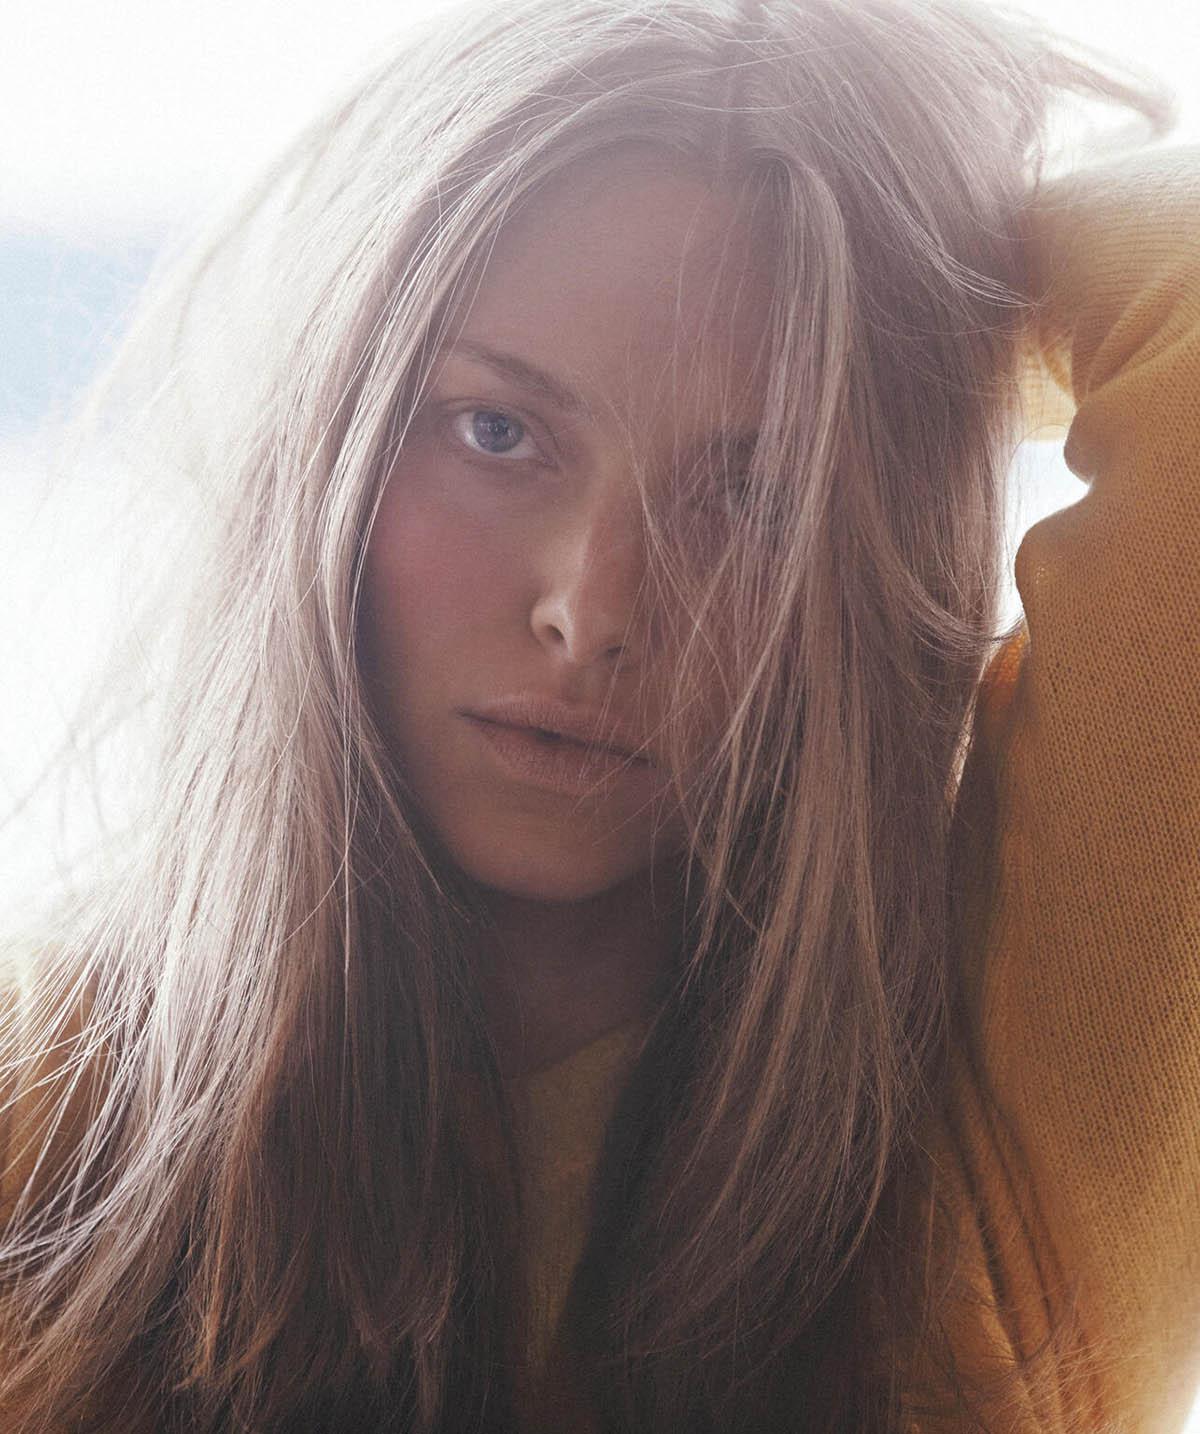 Amanda Seyfried covers Vogue Australia February 2021 by Lachlan Bailey